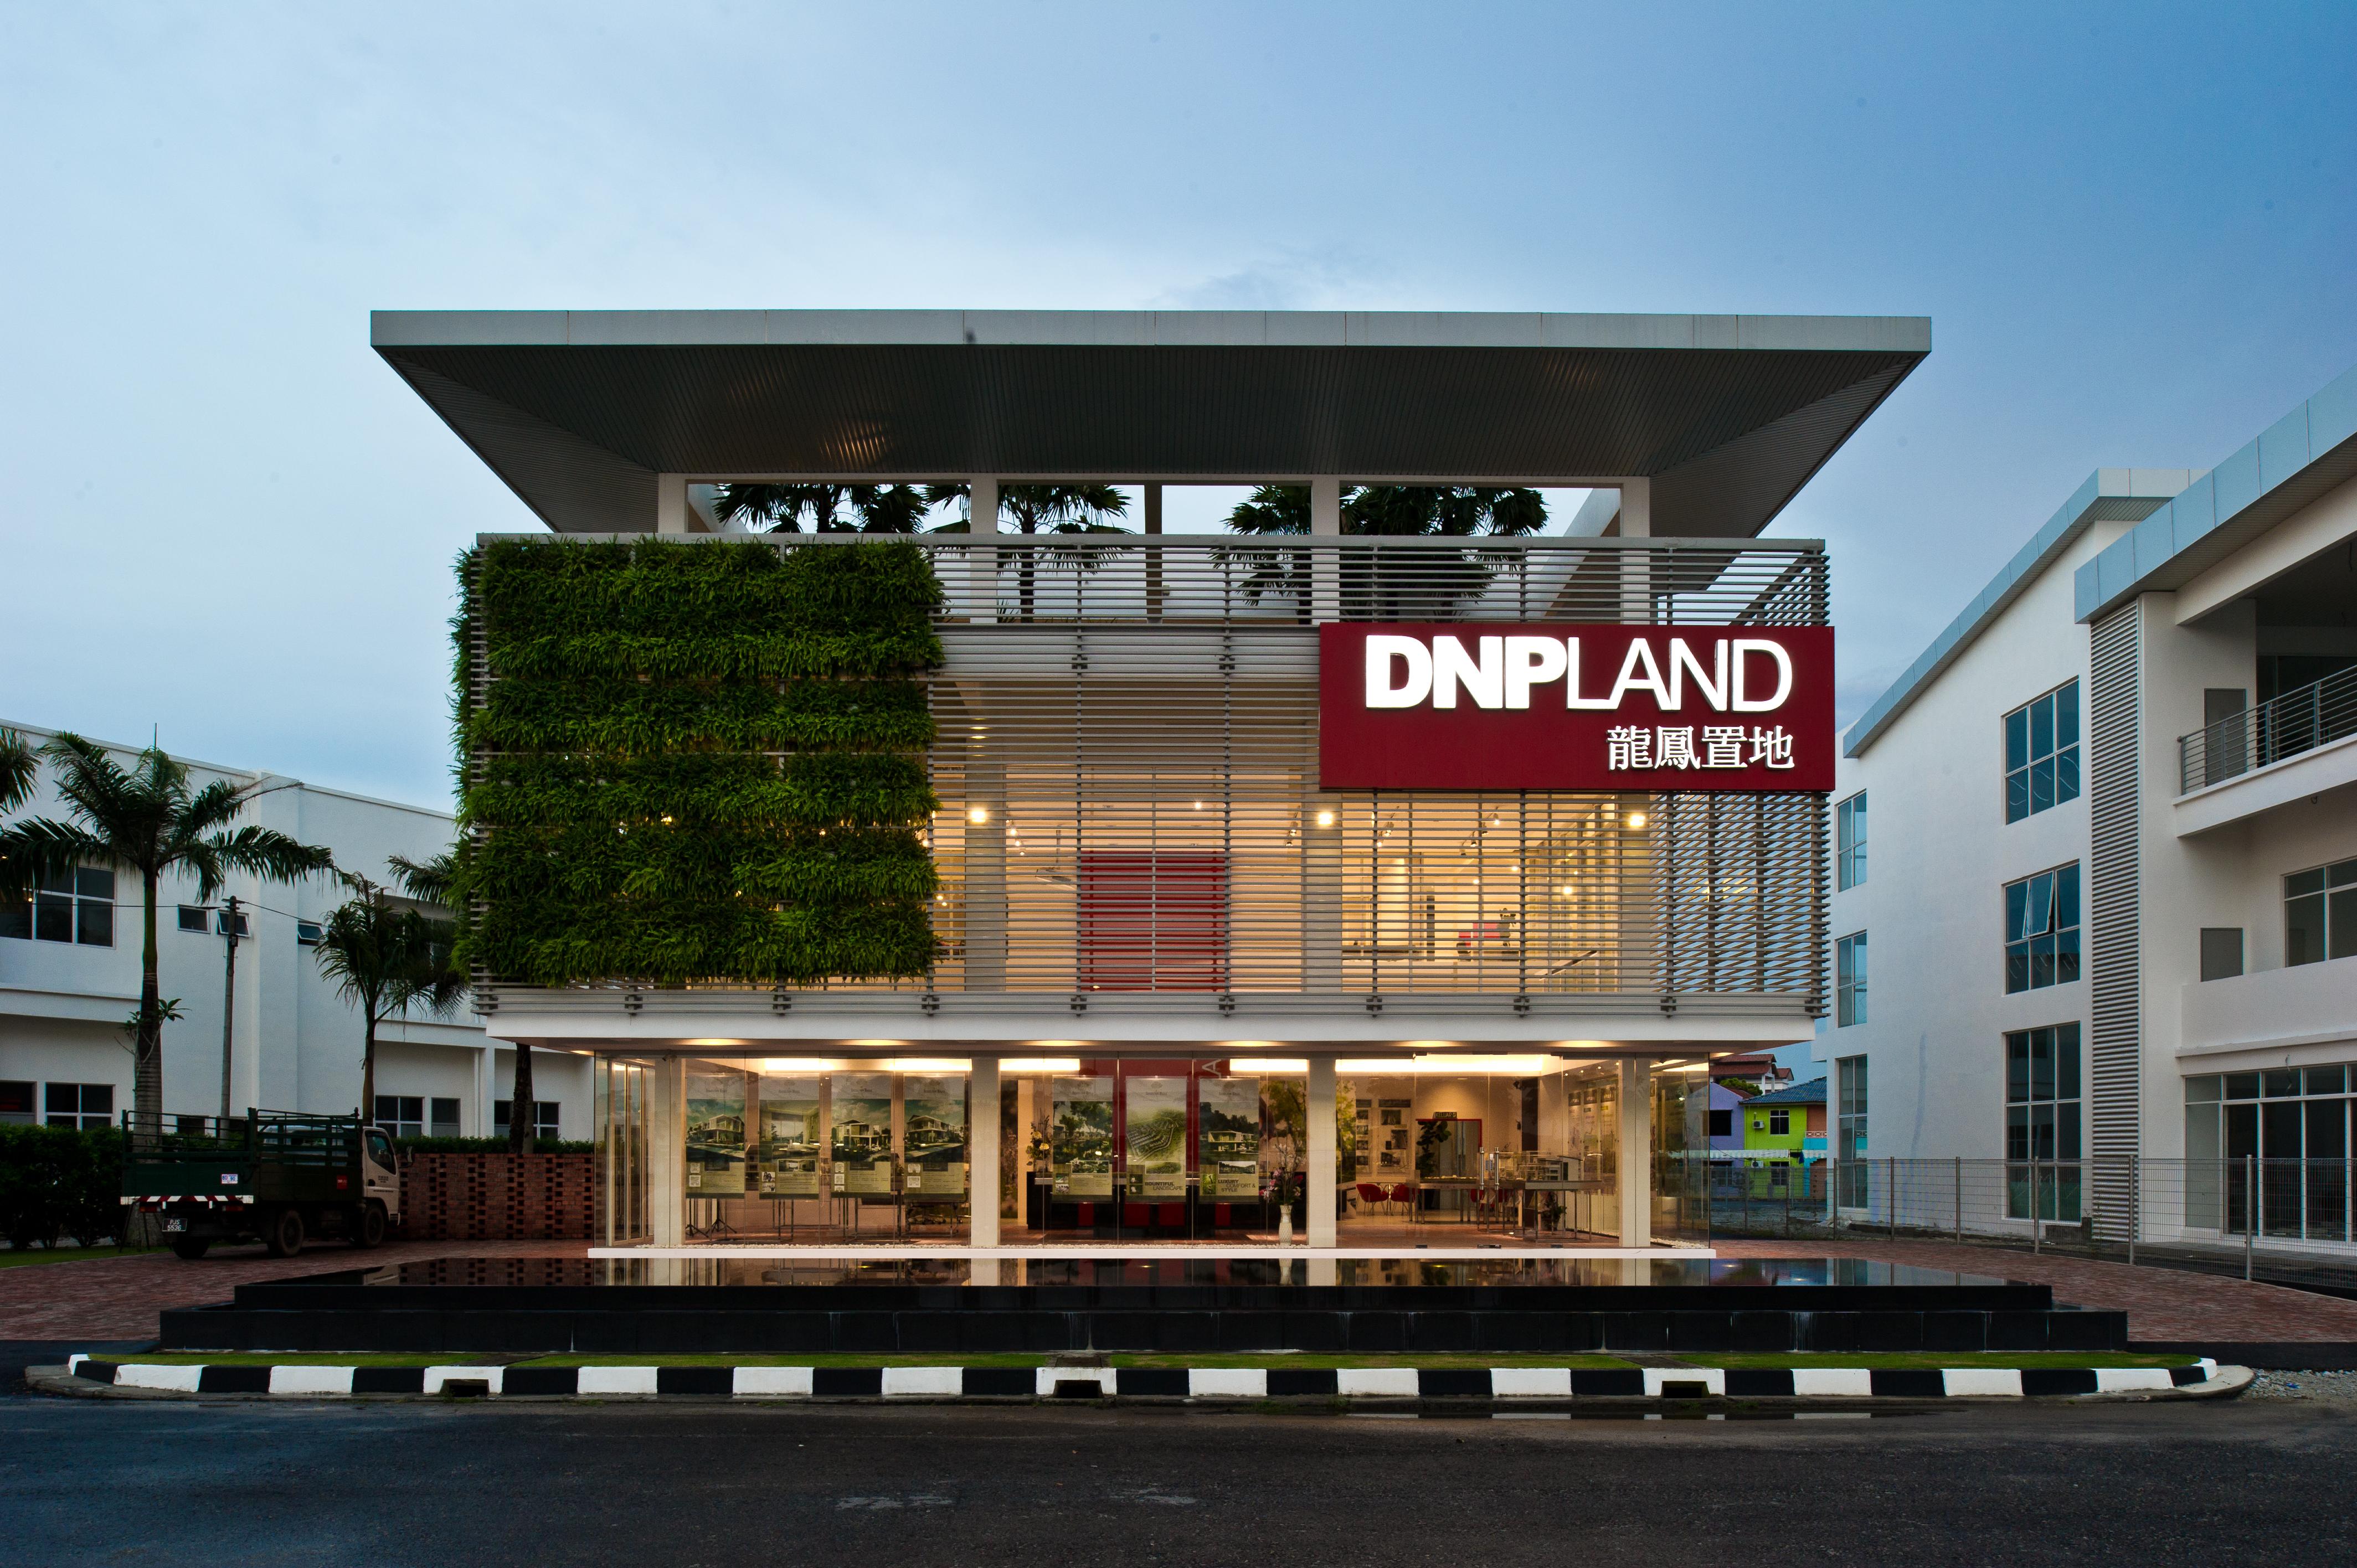 DNP (1 of 4)